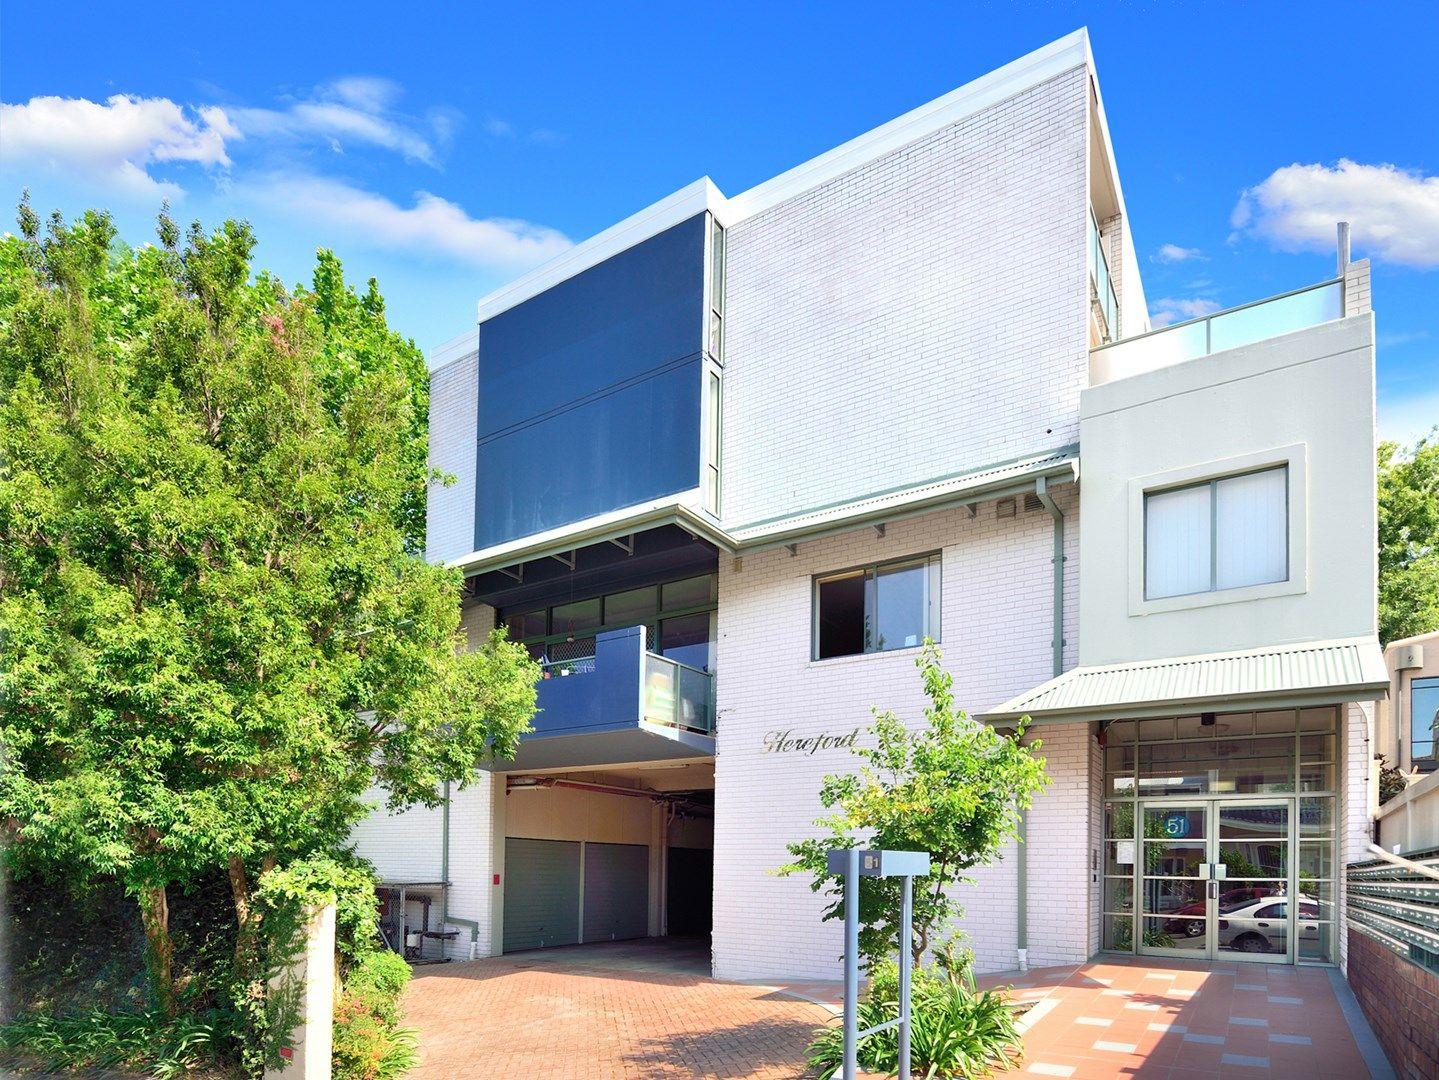 73/51 Hereford Street, Glebe NSW 2037, Image 0